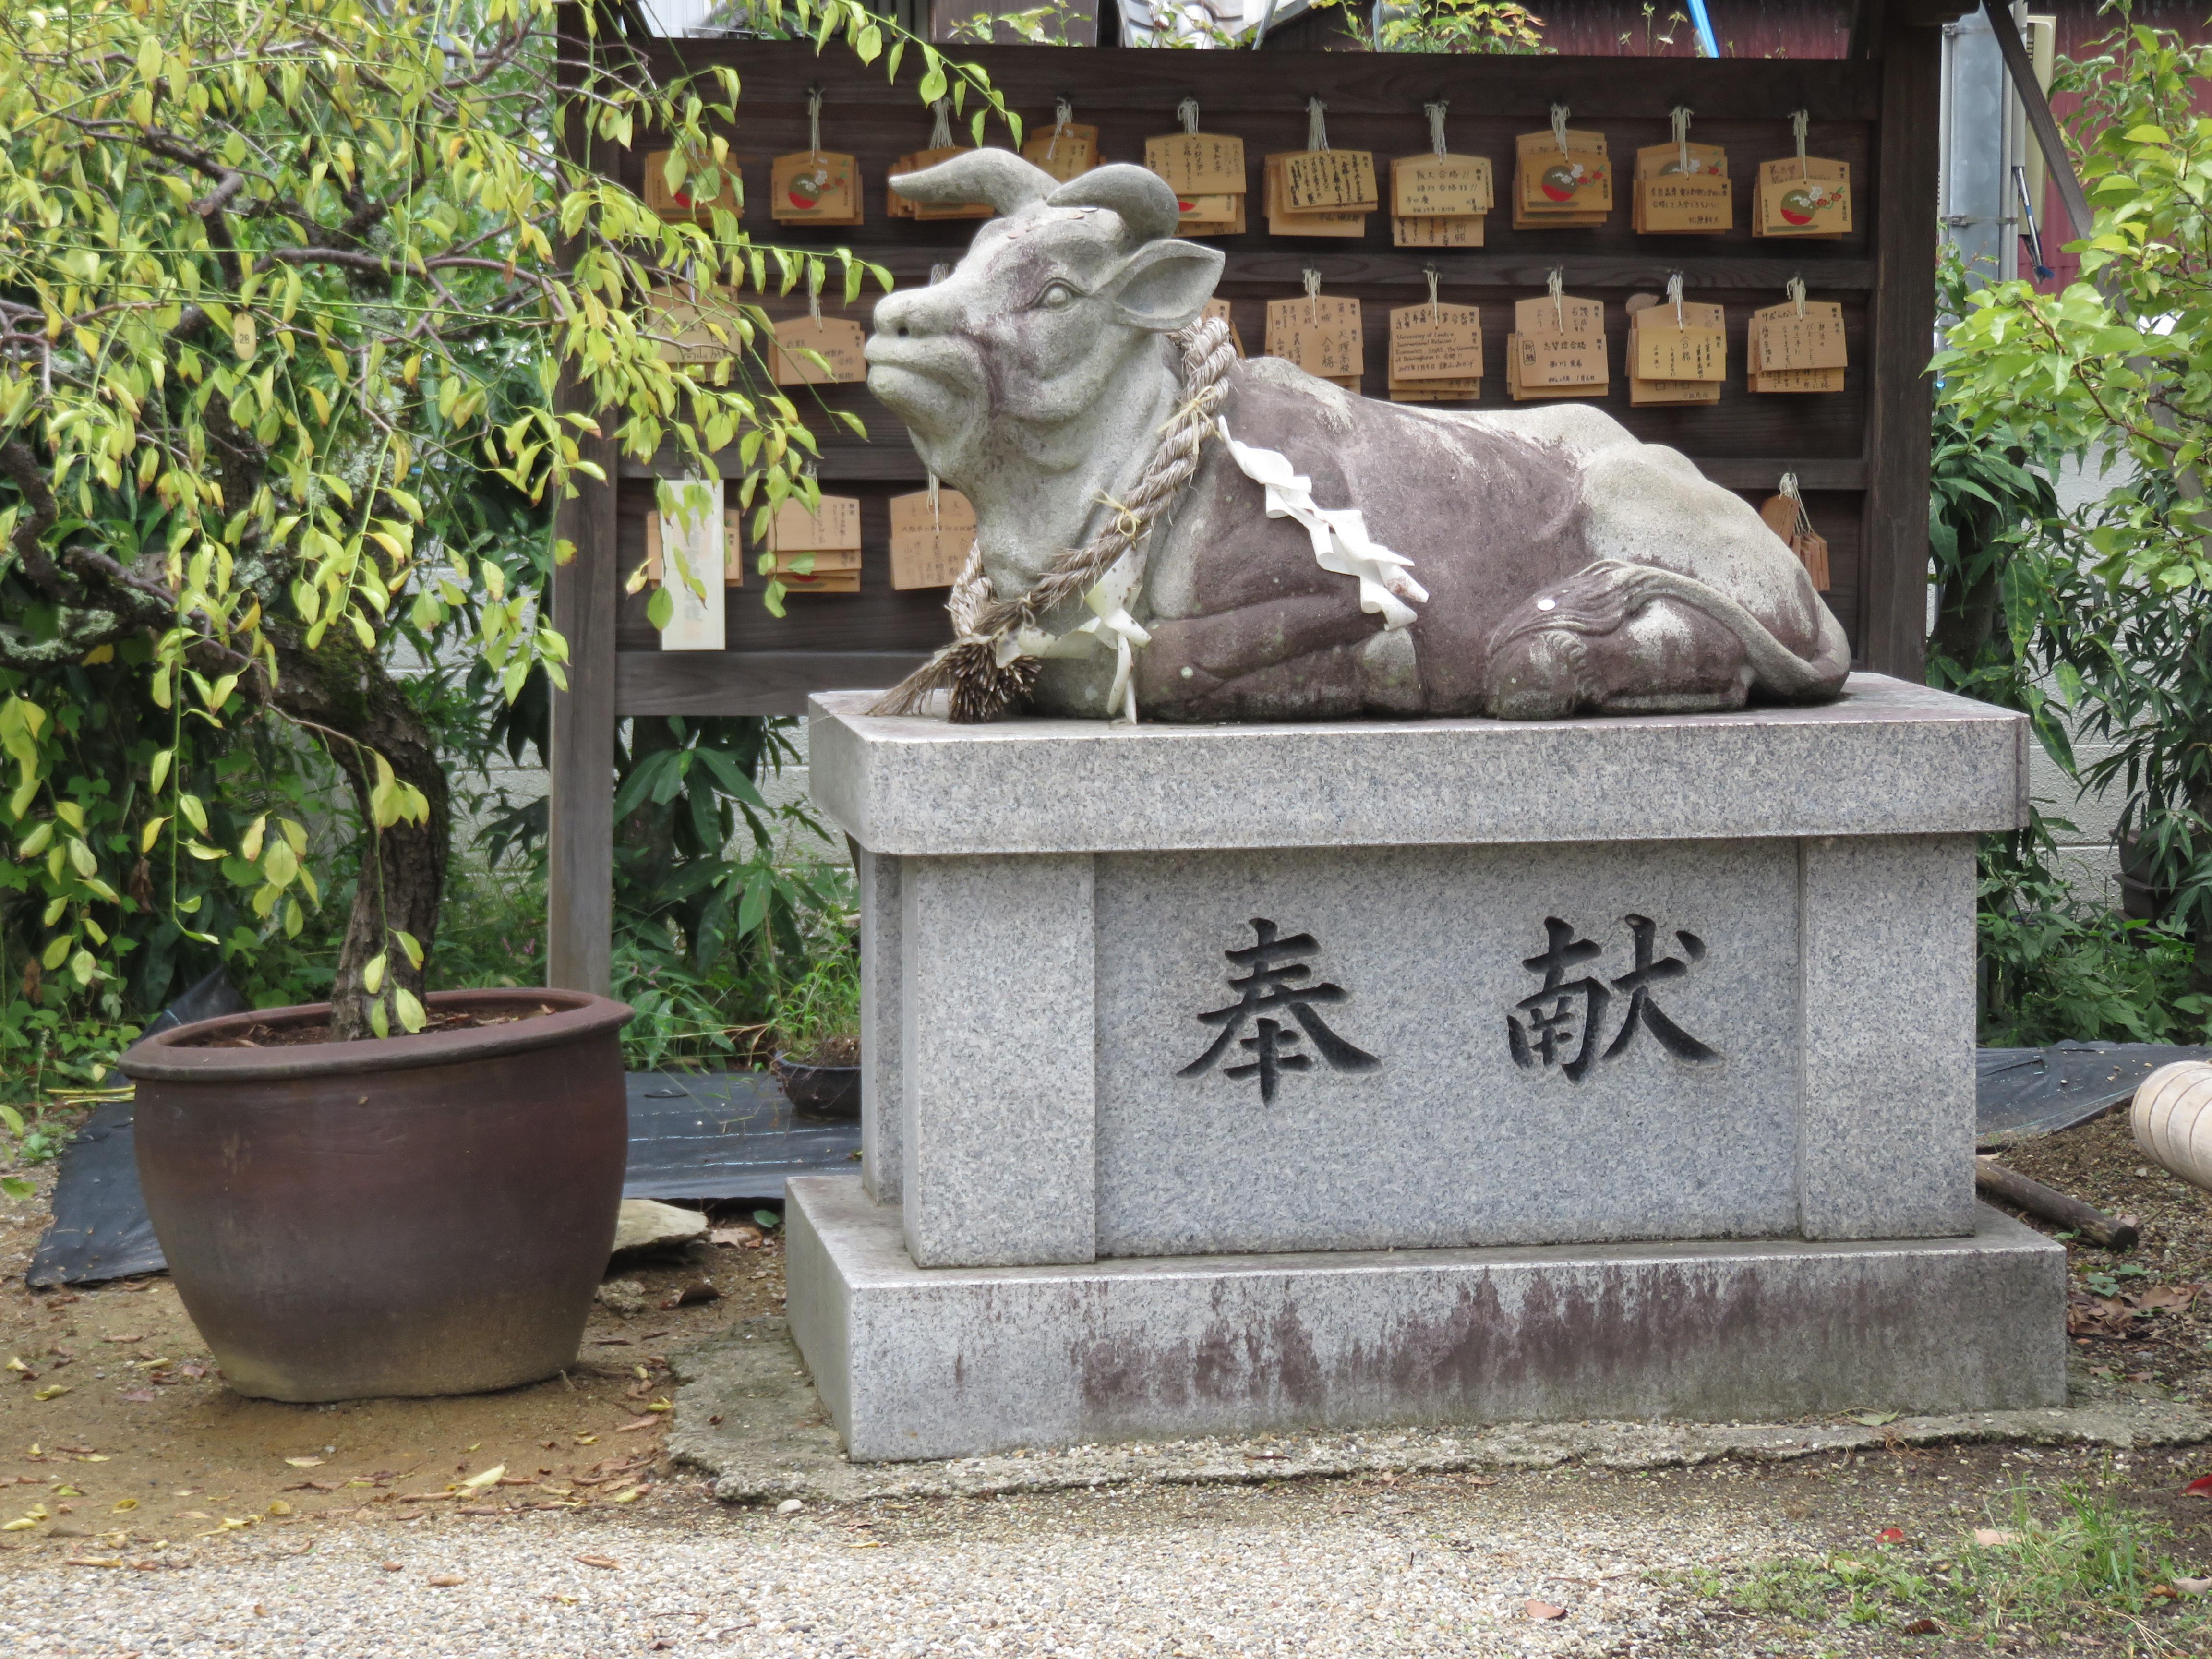 菅原天満宮(菅原神社)の像